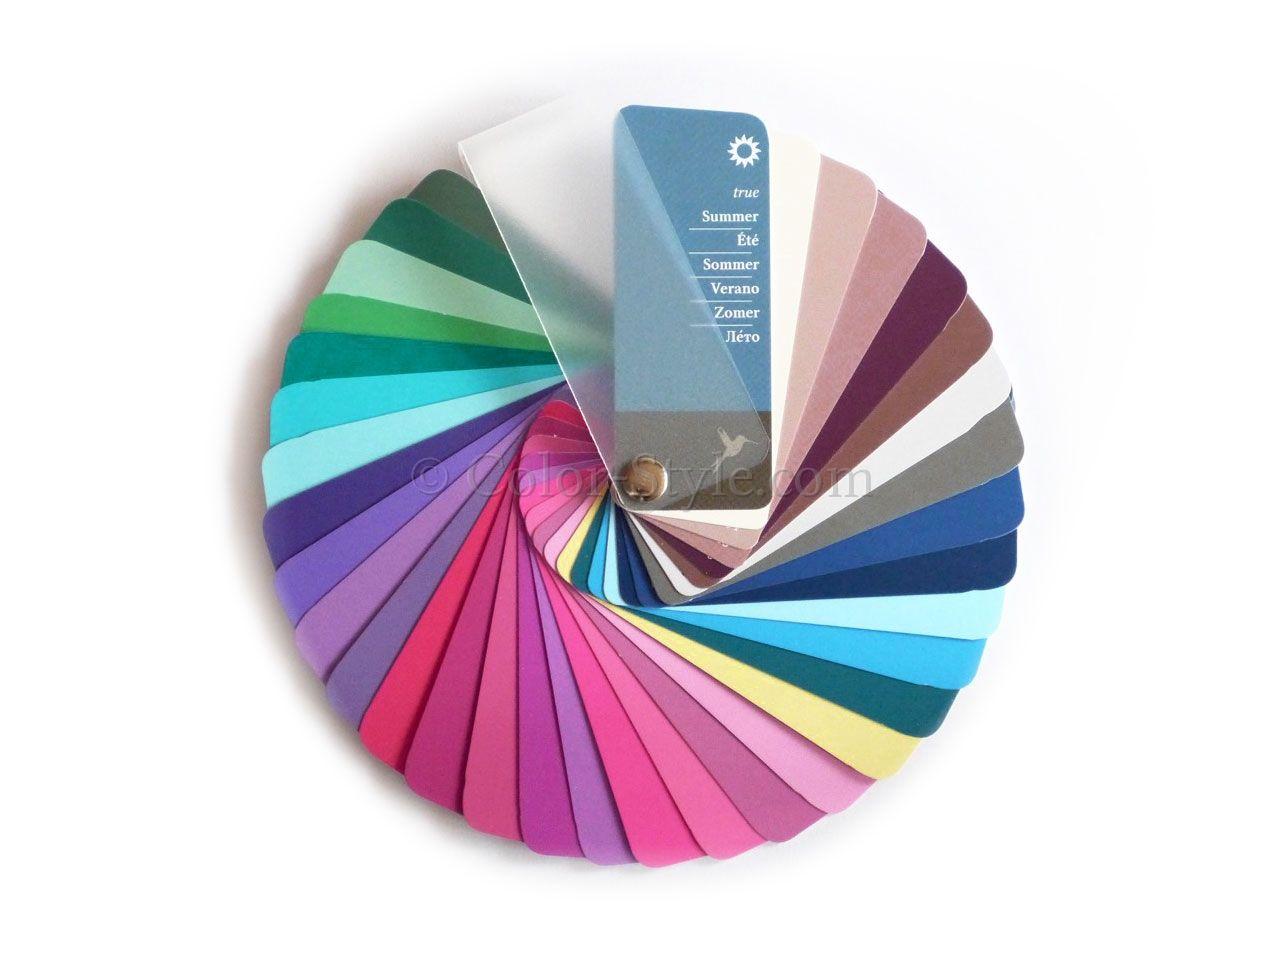 dieser farbpass sommer in f cherform enth lt 35 typgerechte farben f r den farbtyp sommer den. Black Bedroom Furniture Sets. Home Design Ideas